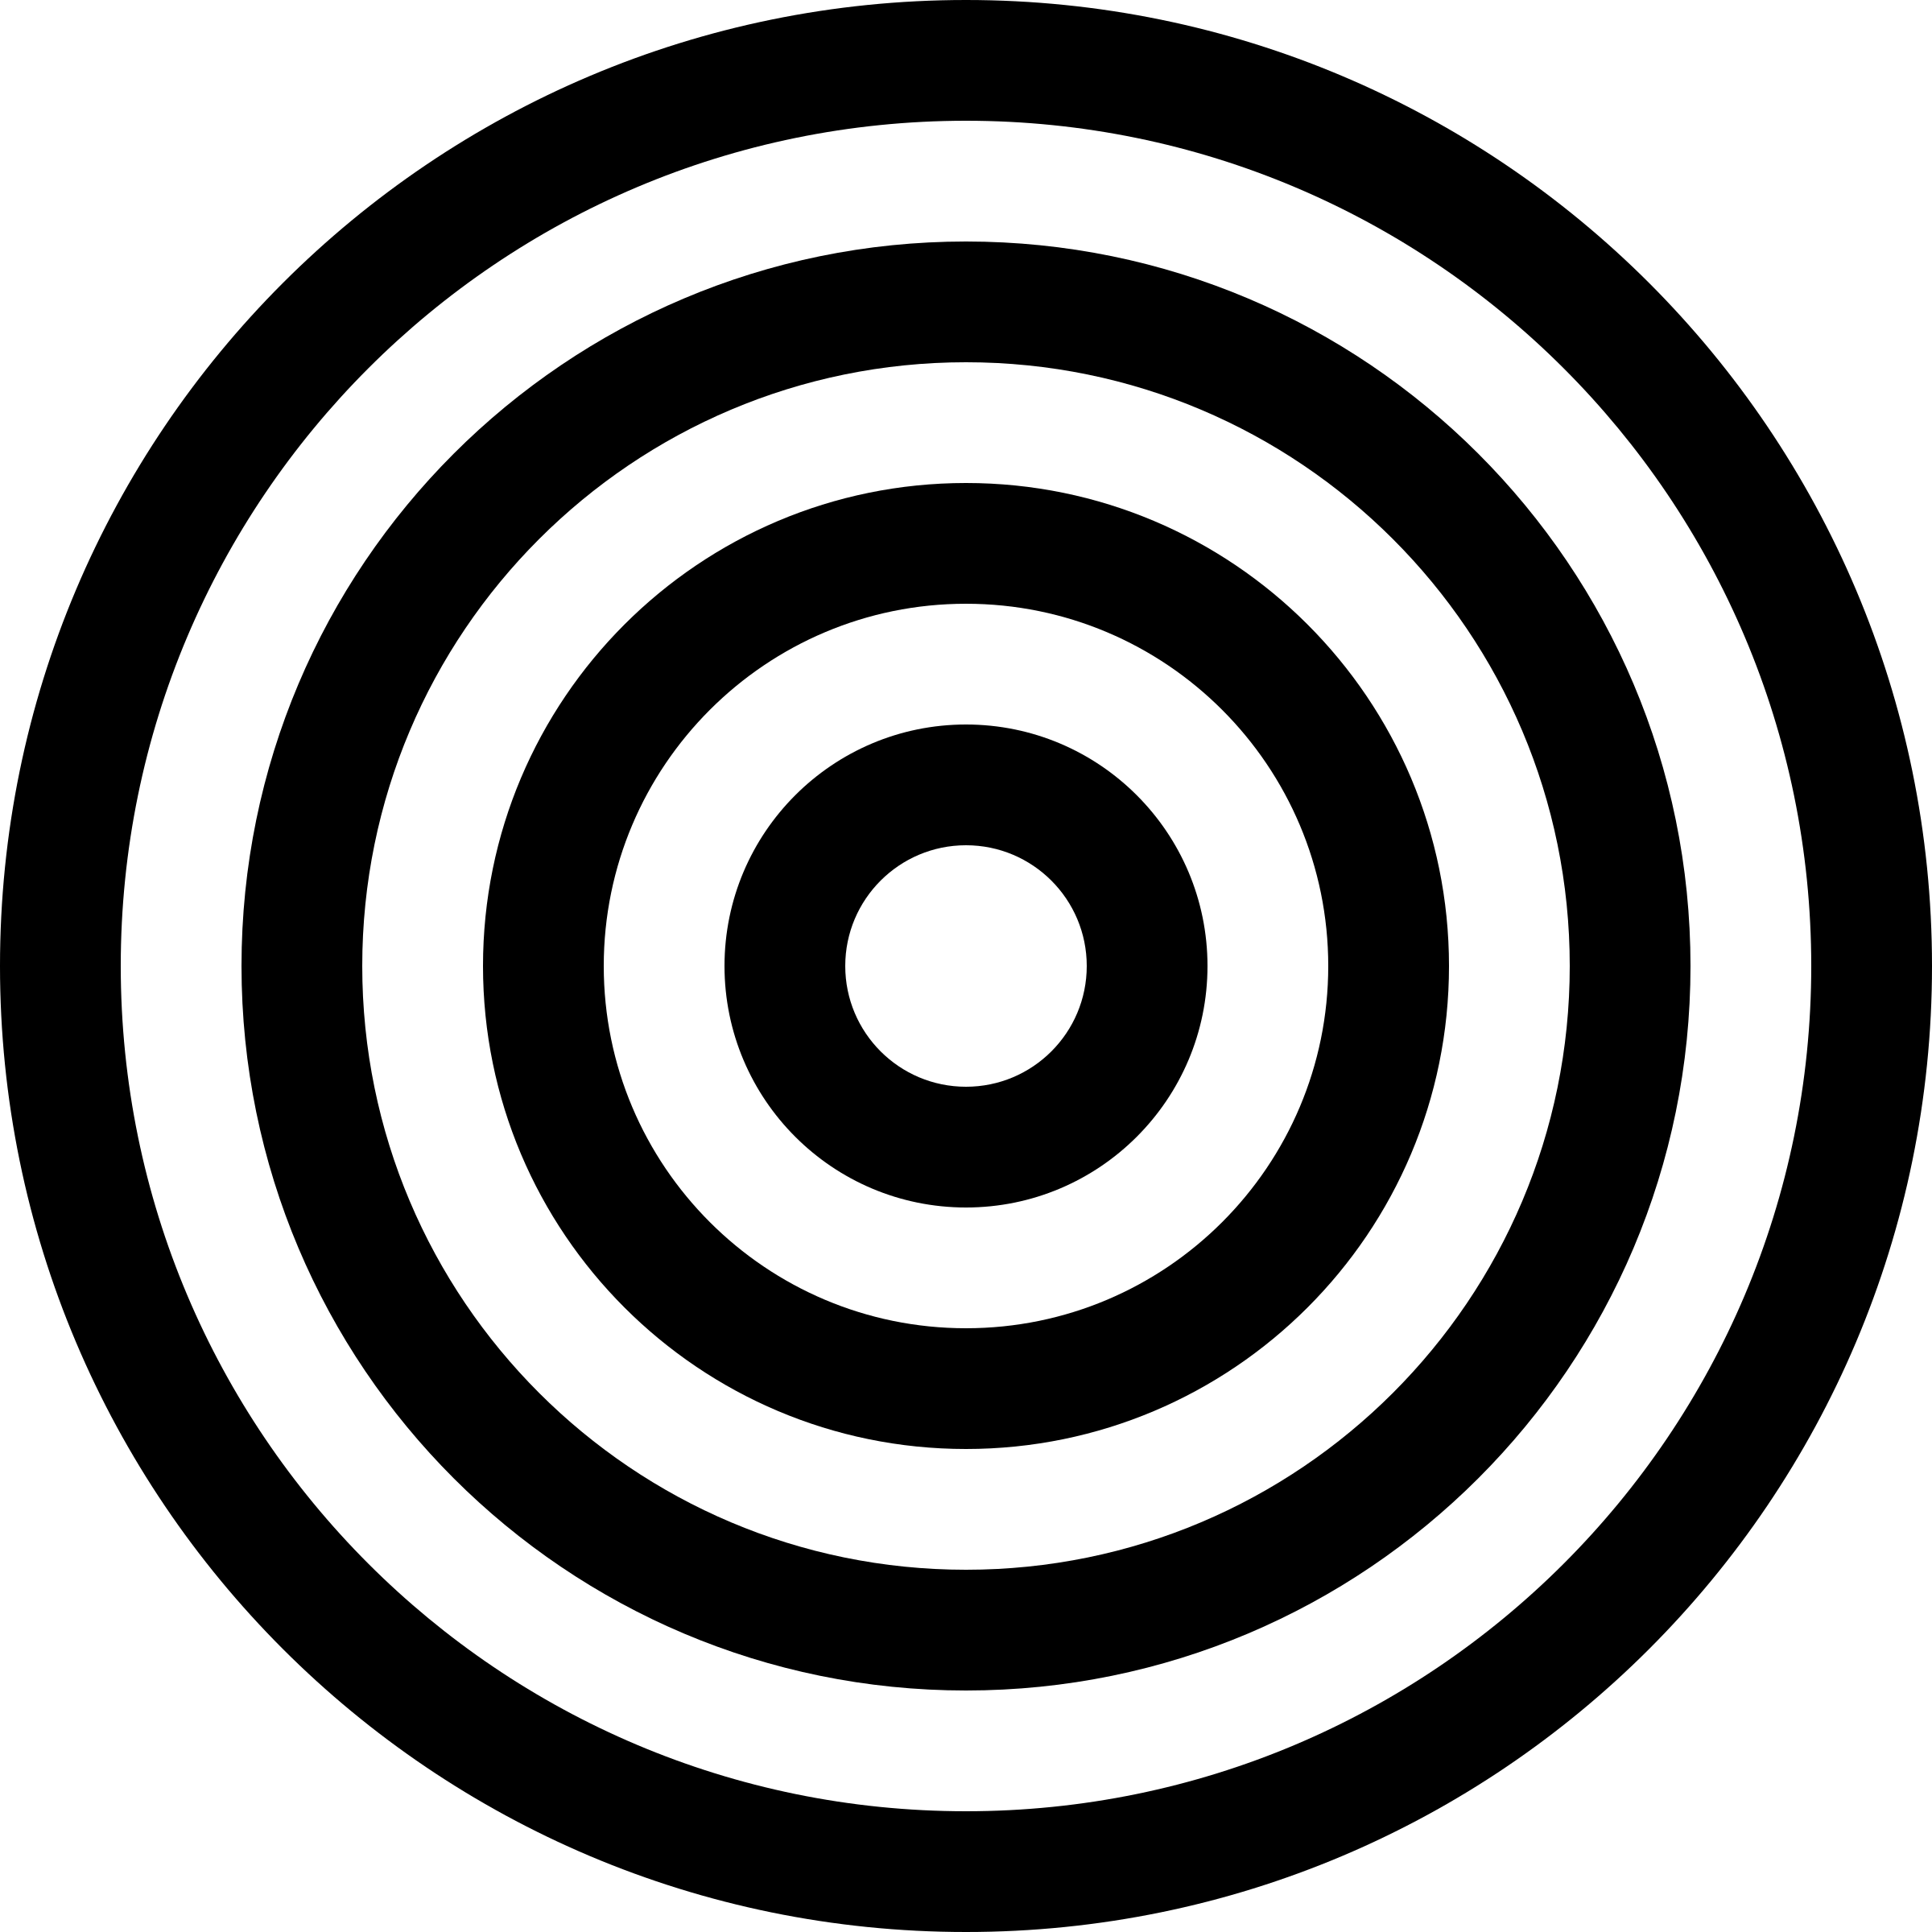 Clip art free panda. Focus clipart board target